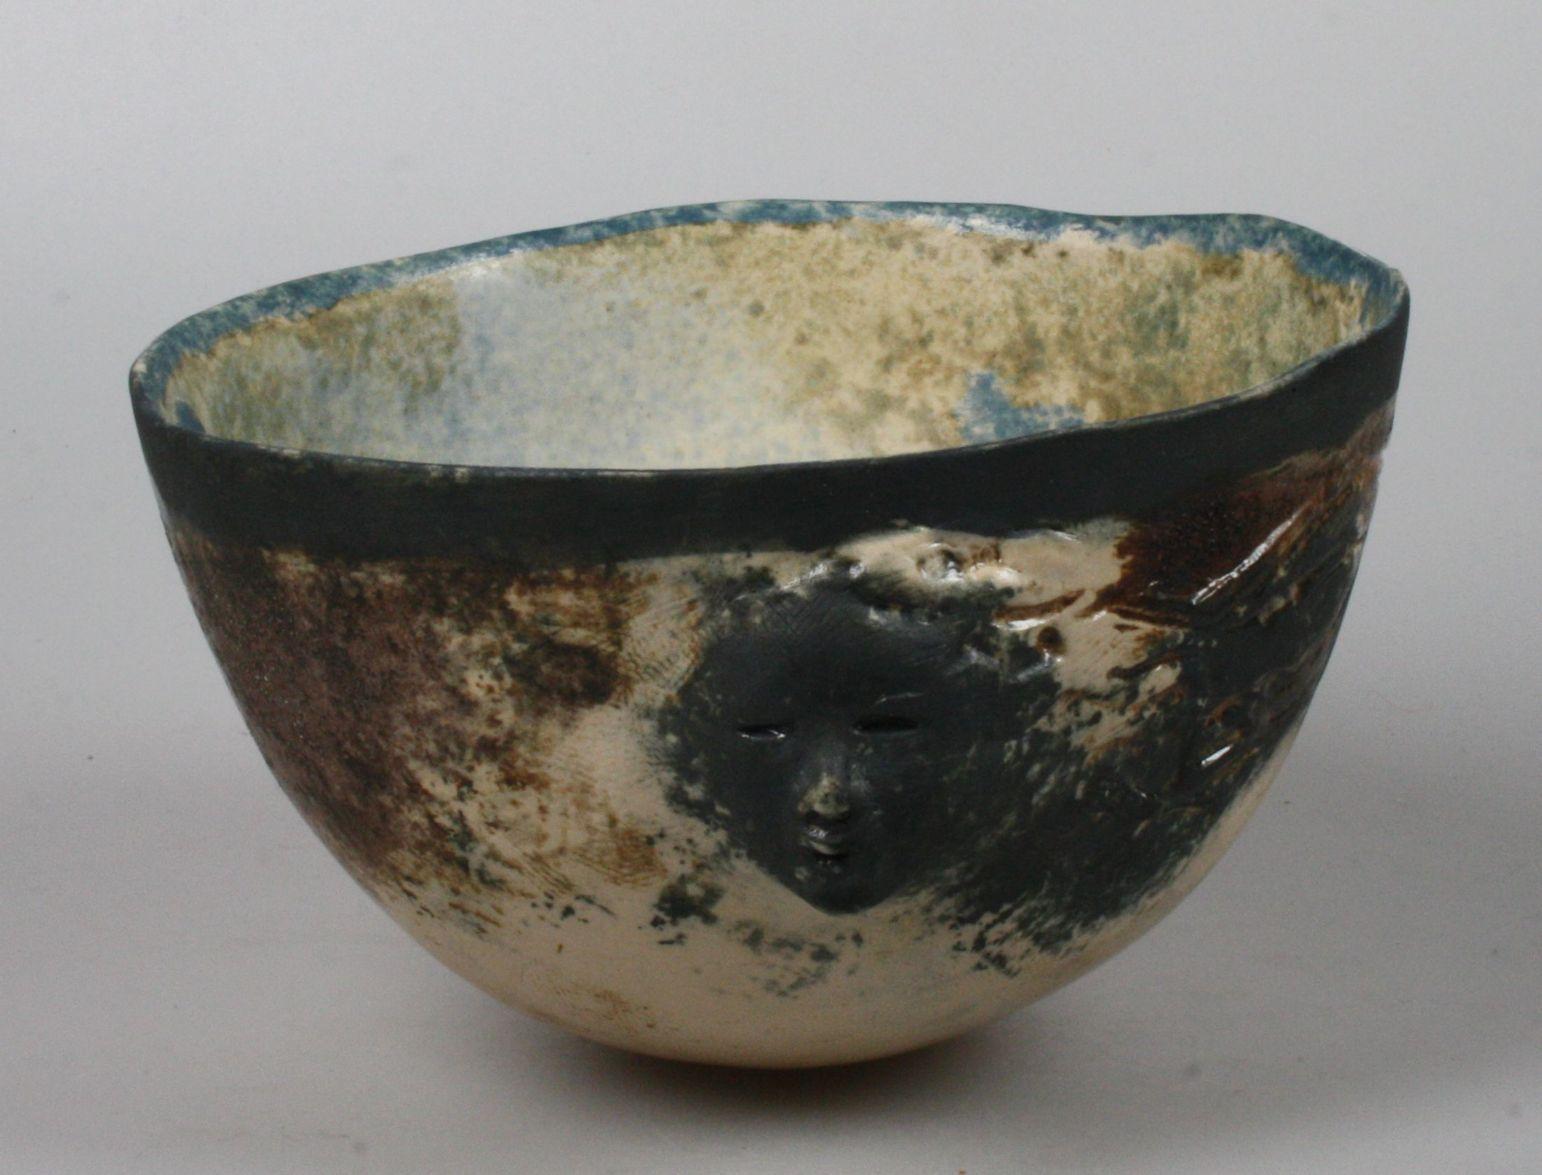 Lies Cosijn bowl